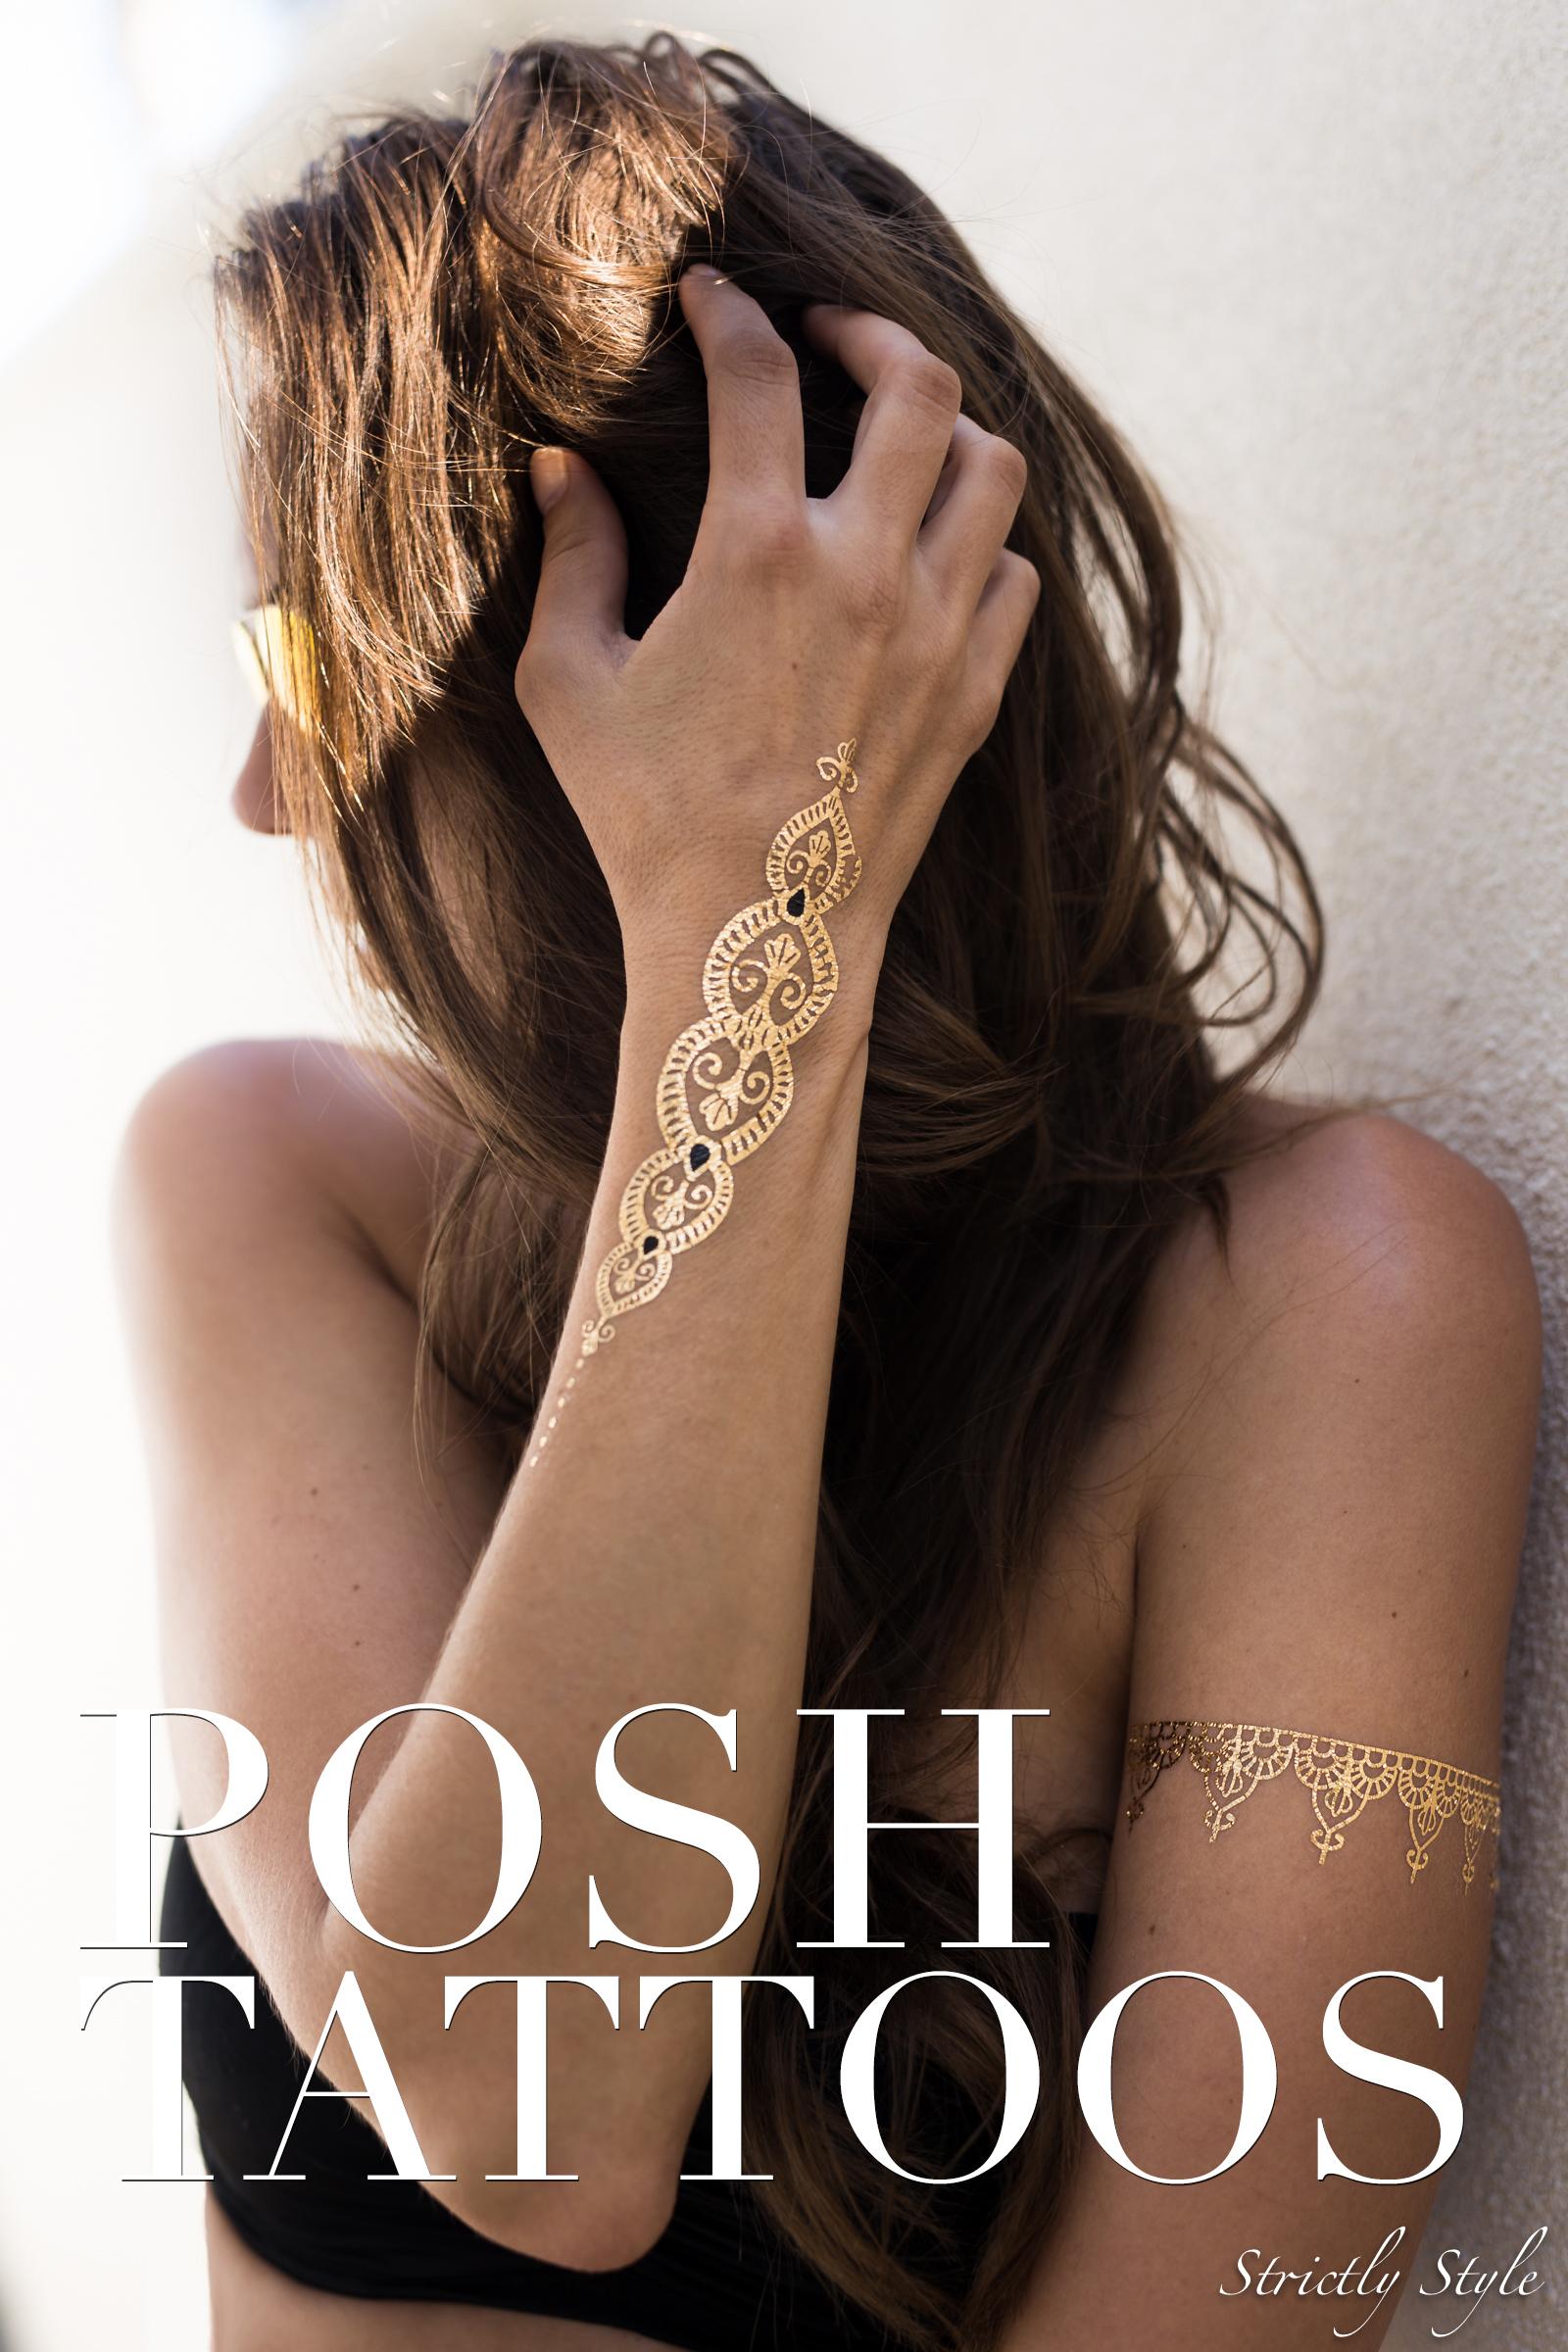 posh tattoos-8859TITLE